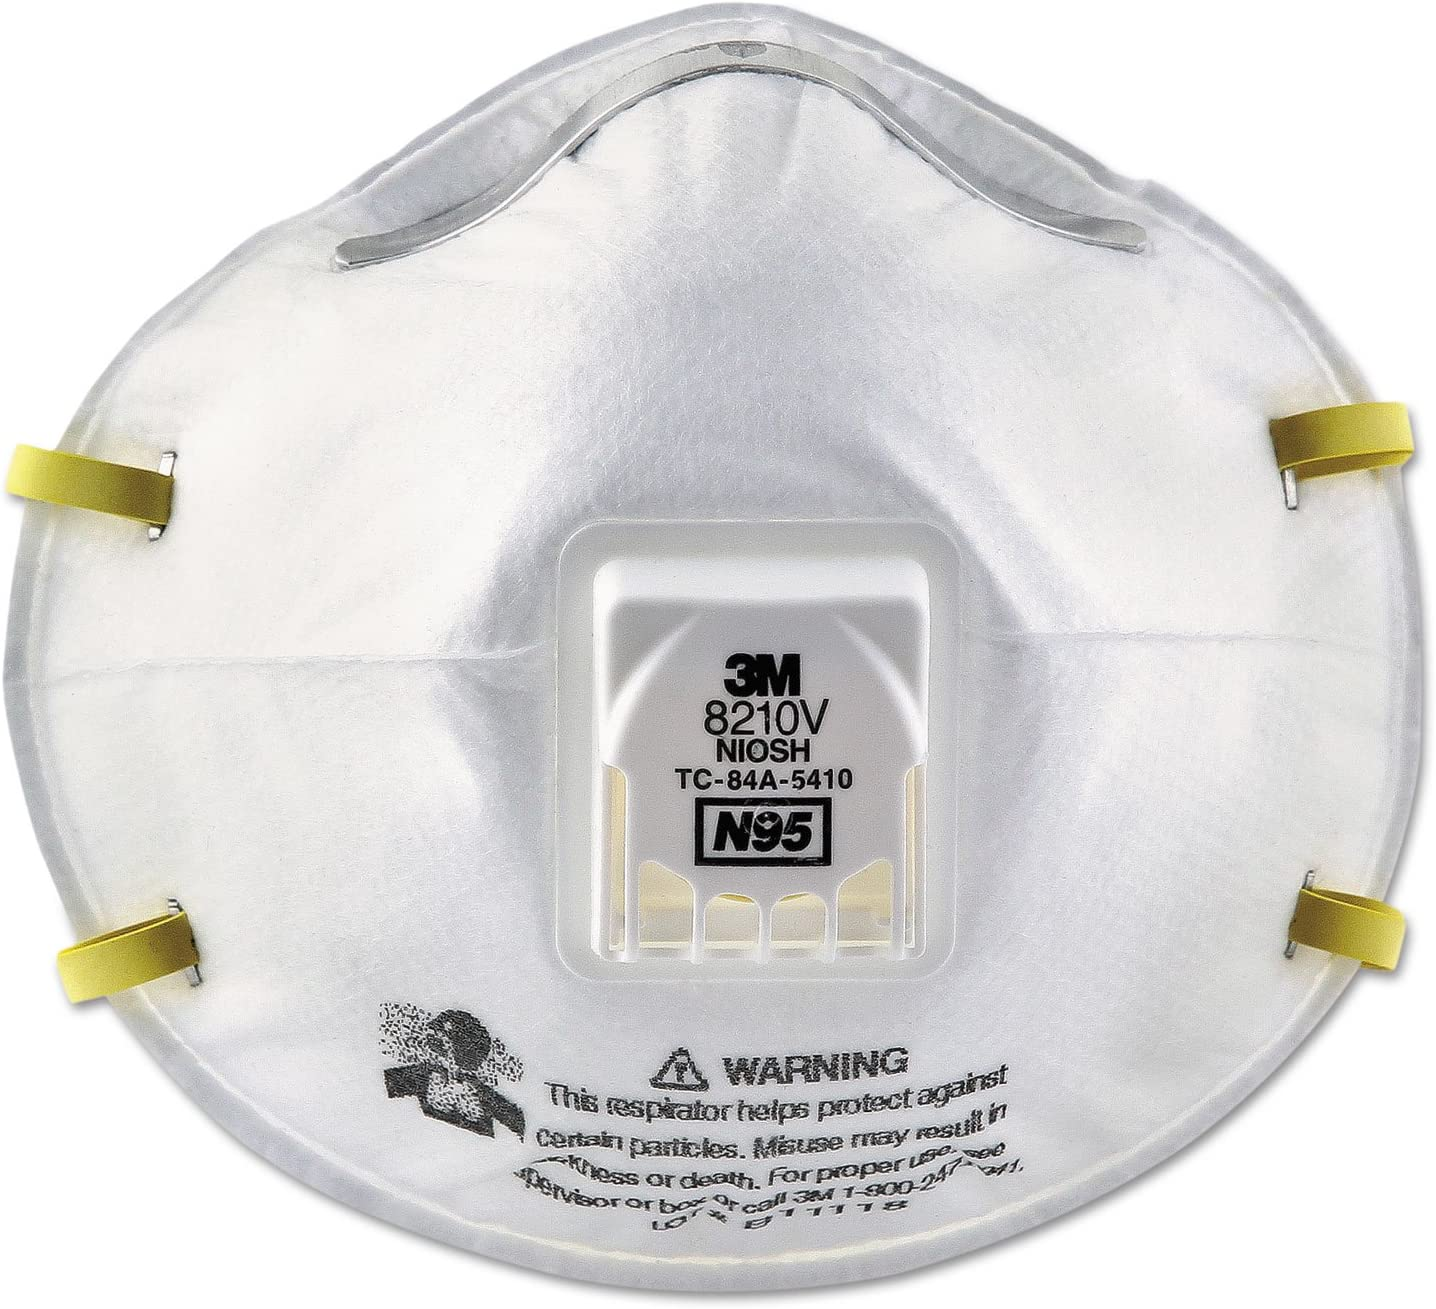 3m 8210v n95 particulate respirator mask